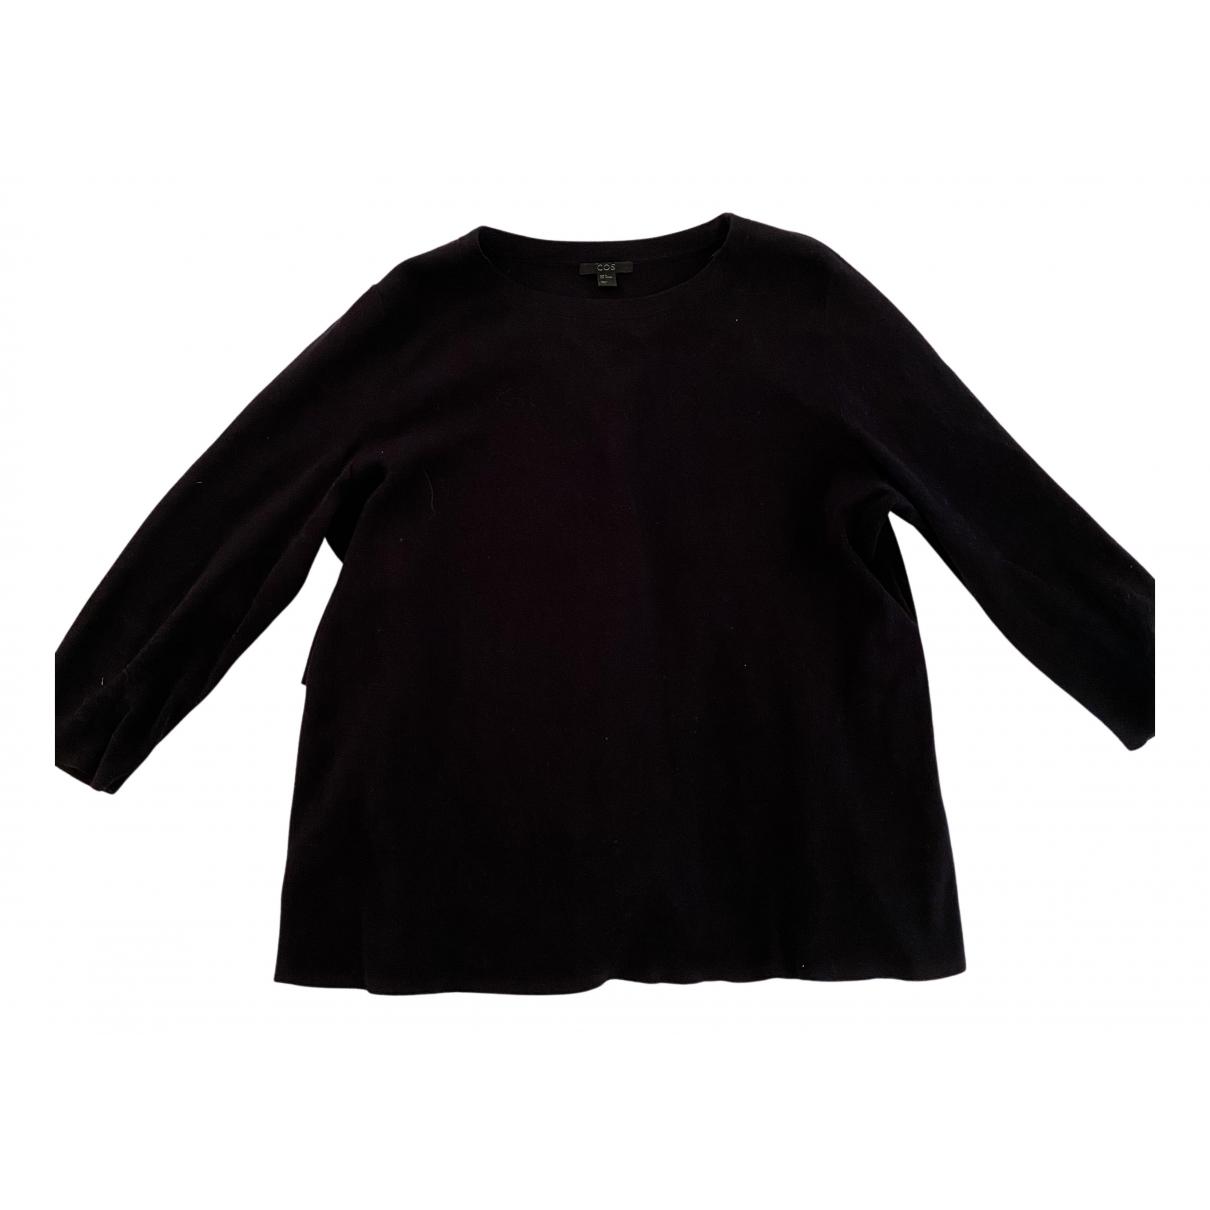 Cos N Navy Cotton Knitwear for Women M International